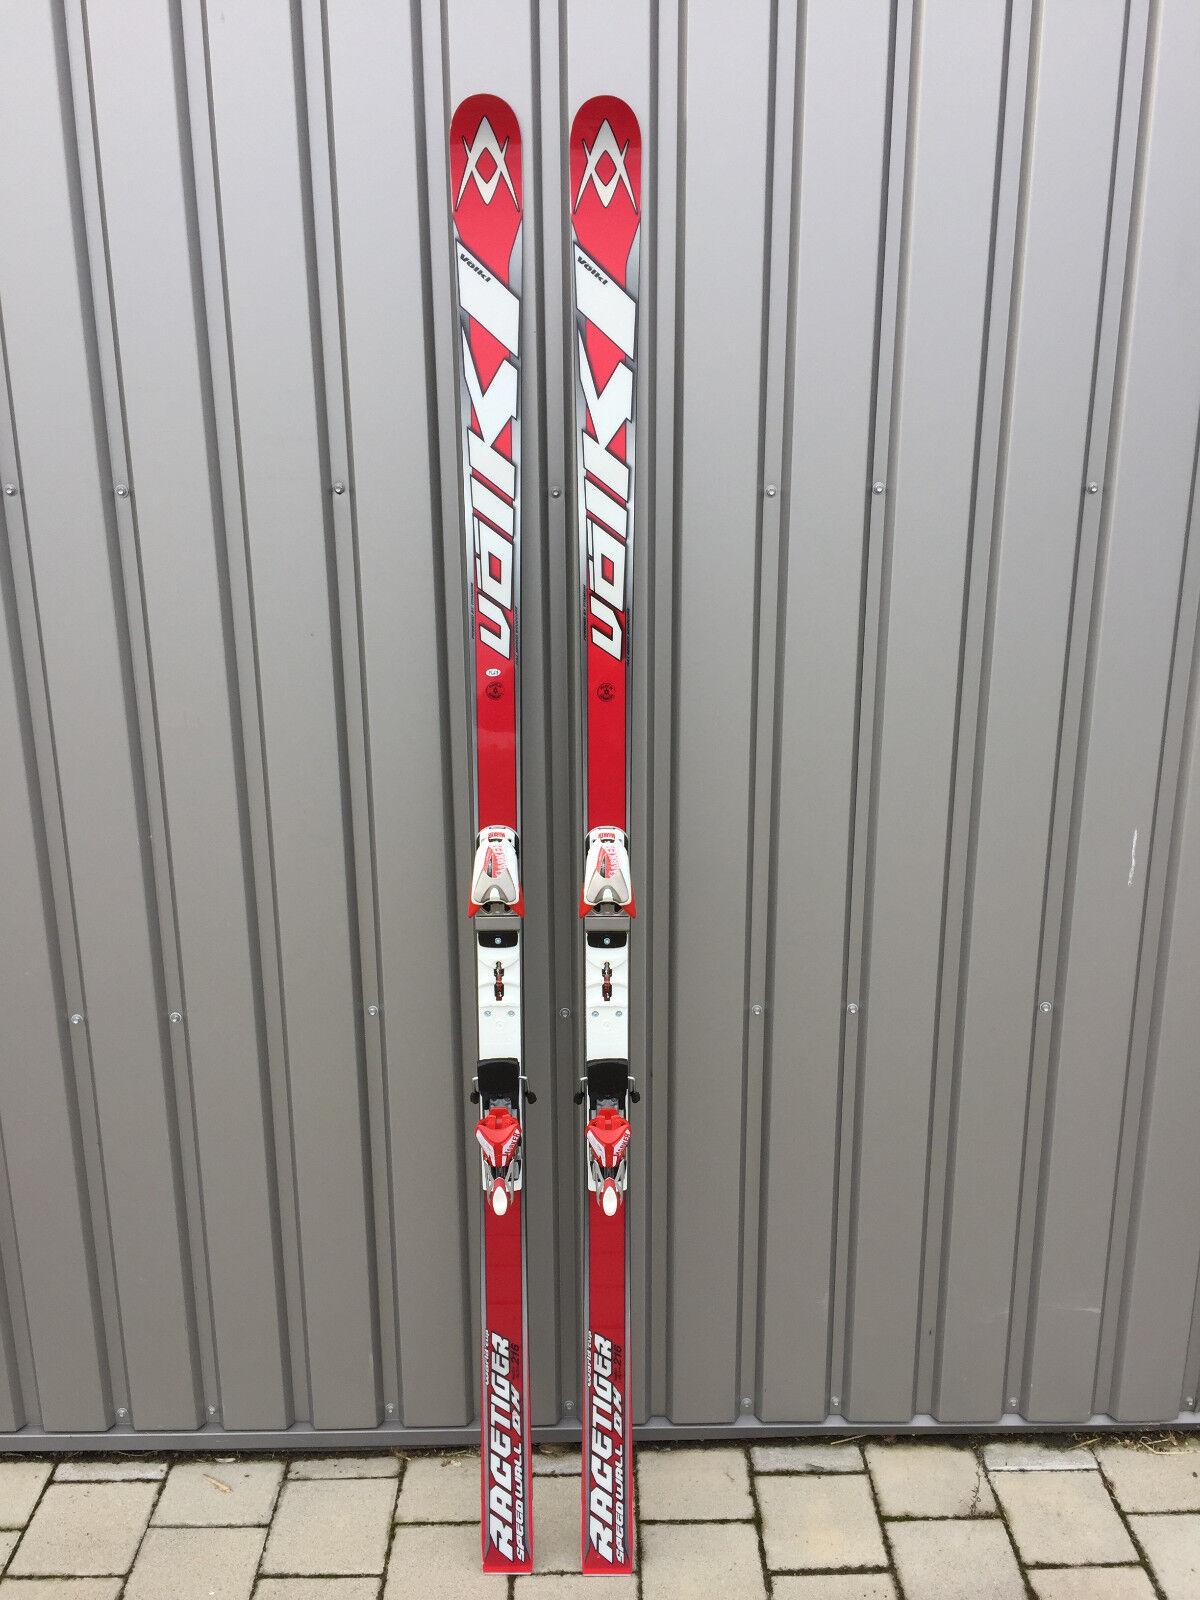 VÖLKL RACETIGER SPEEDWALL DH WORLDCUP Renn-Ski Set 210cm / 45m Radius NEU